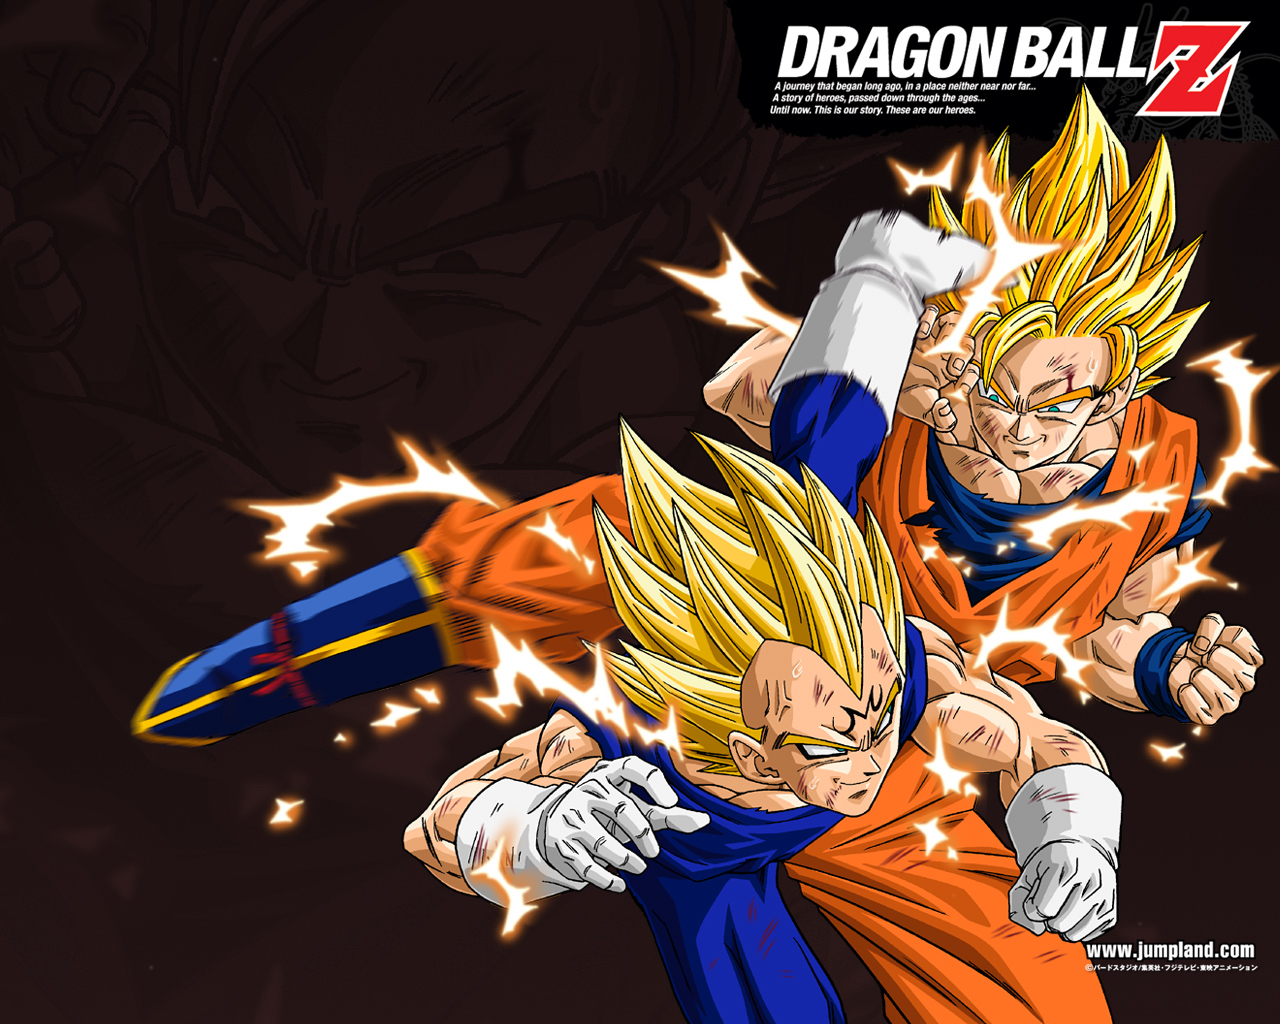 Dragon Ball Dbz Goku Majin Vegeta Wallpaper 1280x1024 Full HD 1280x1024